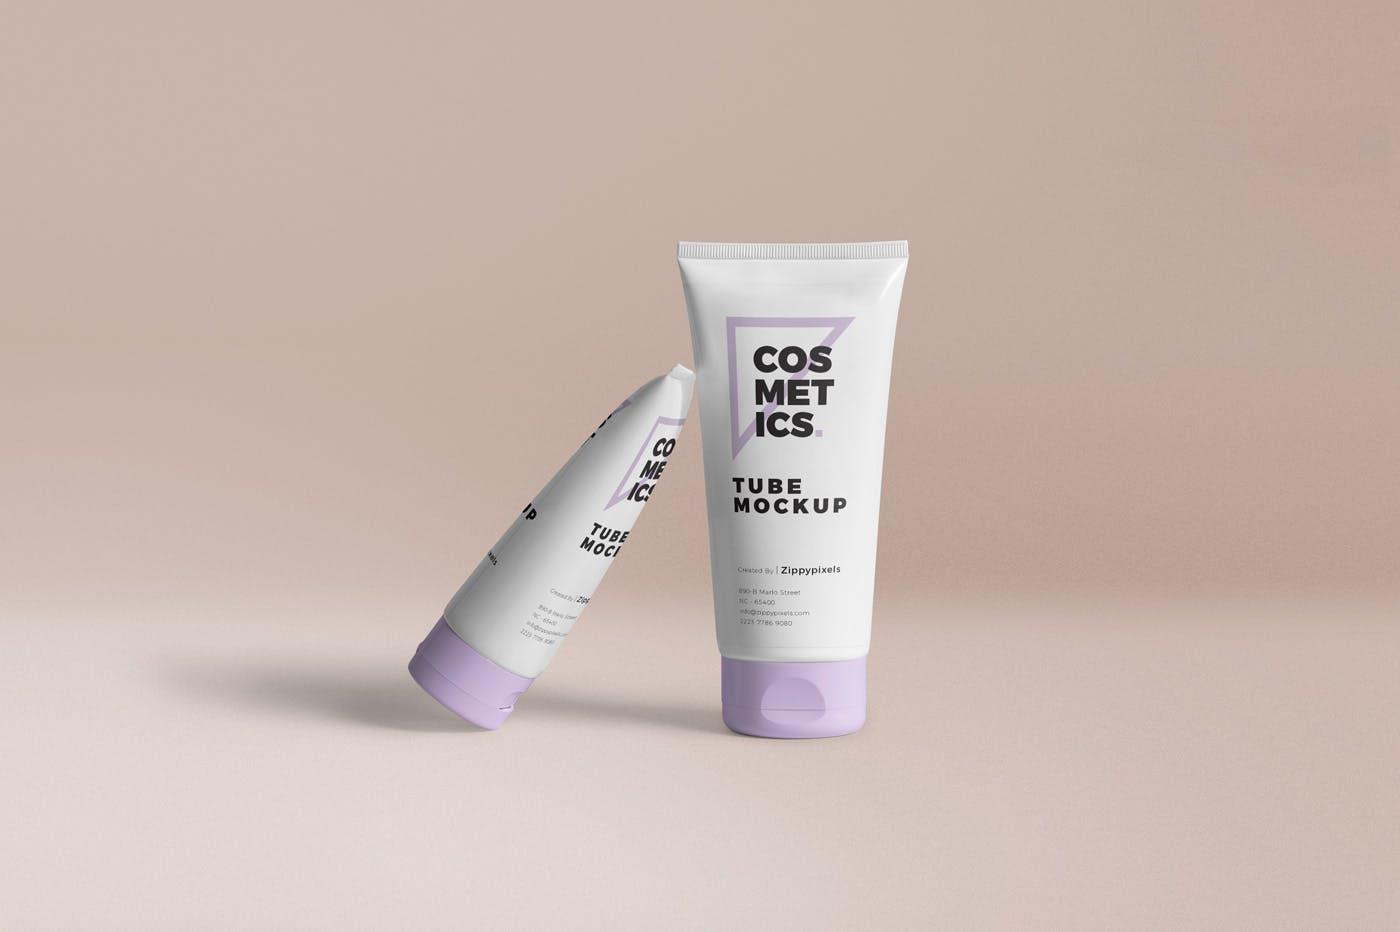 洗化用品样机素材模板展示效果图样机展示Cosmetic Packaging Tube Mockups